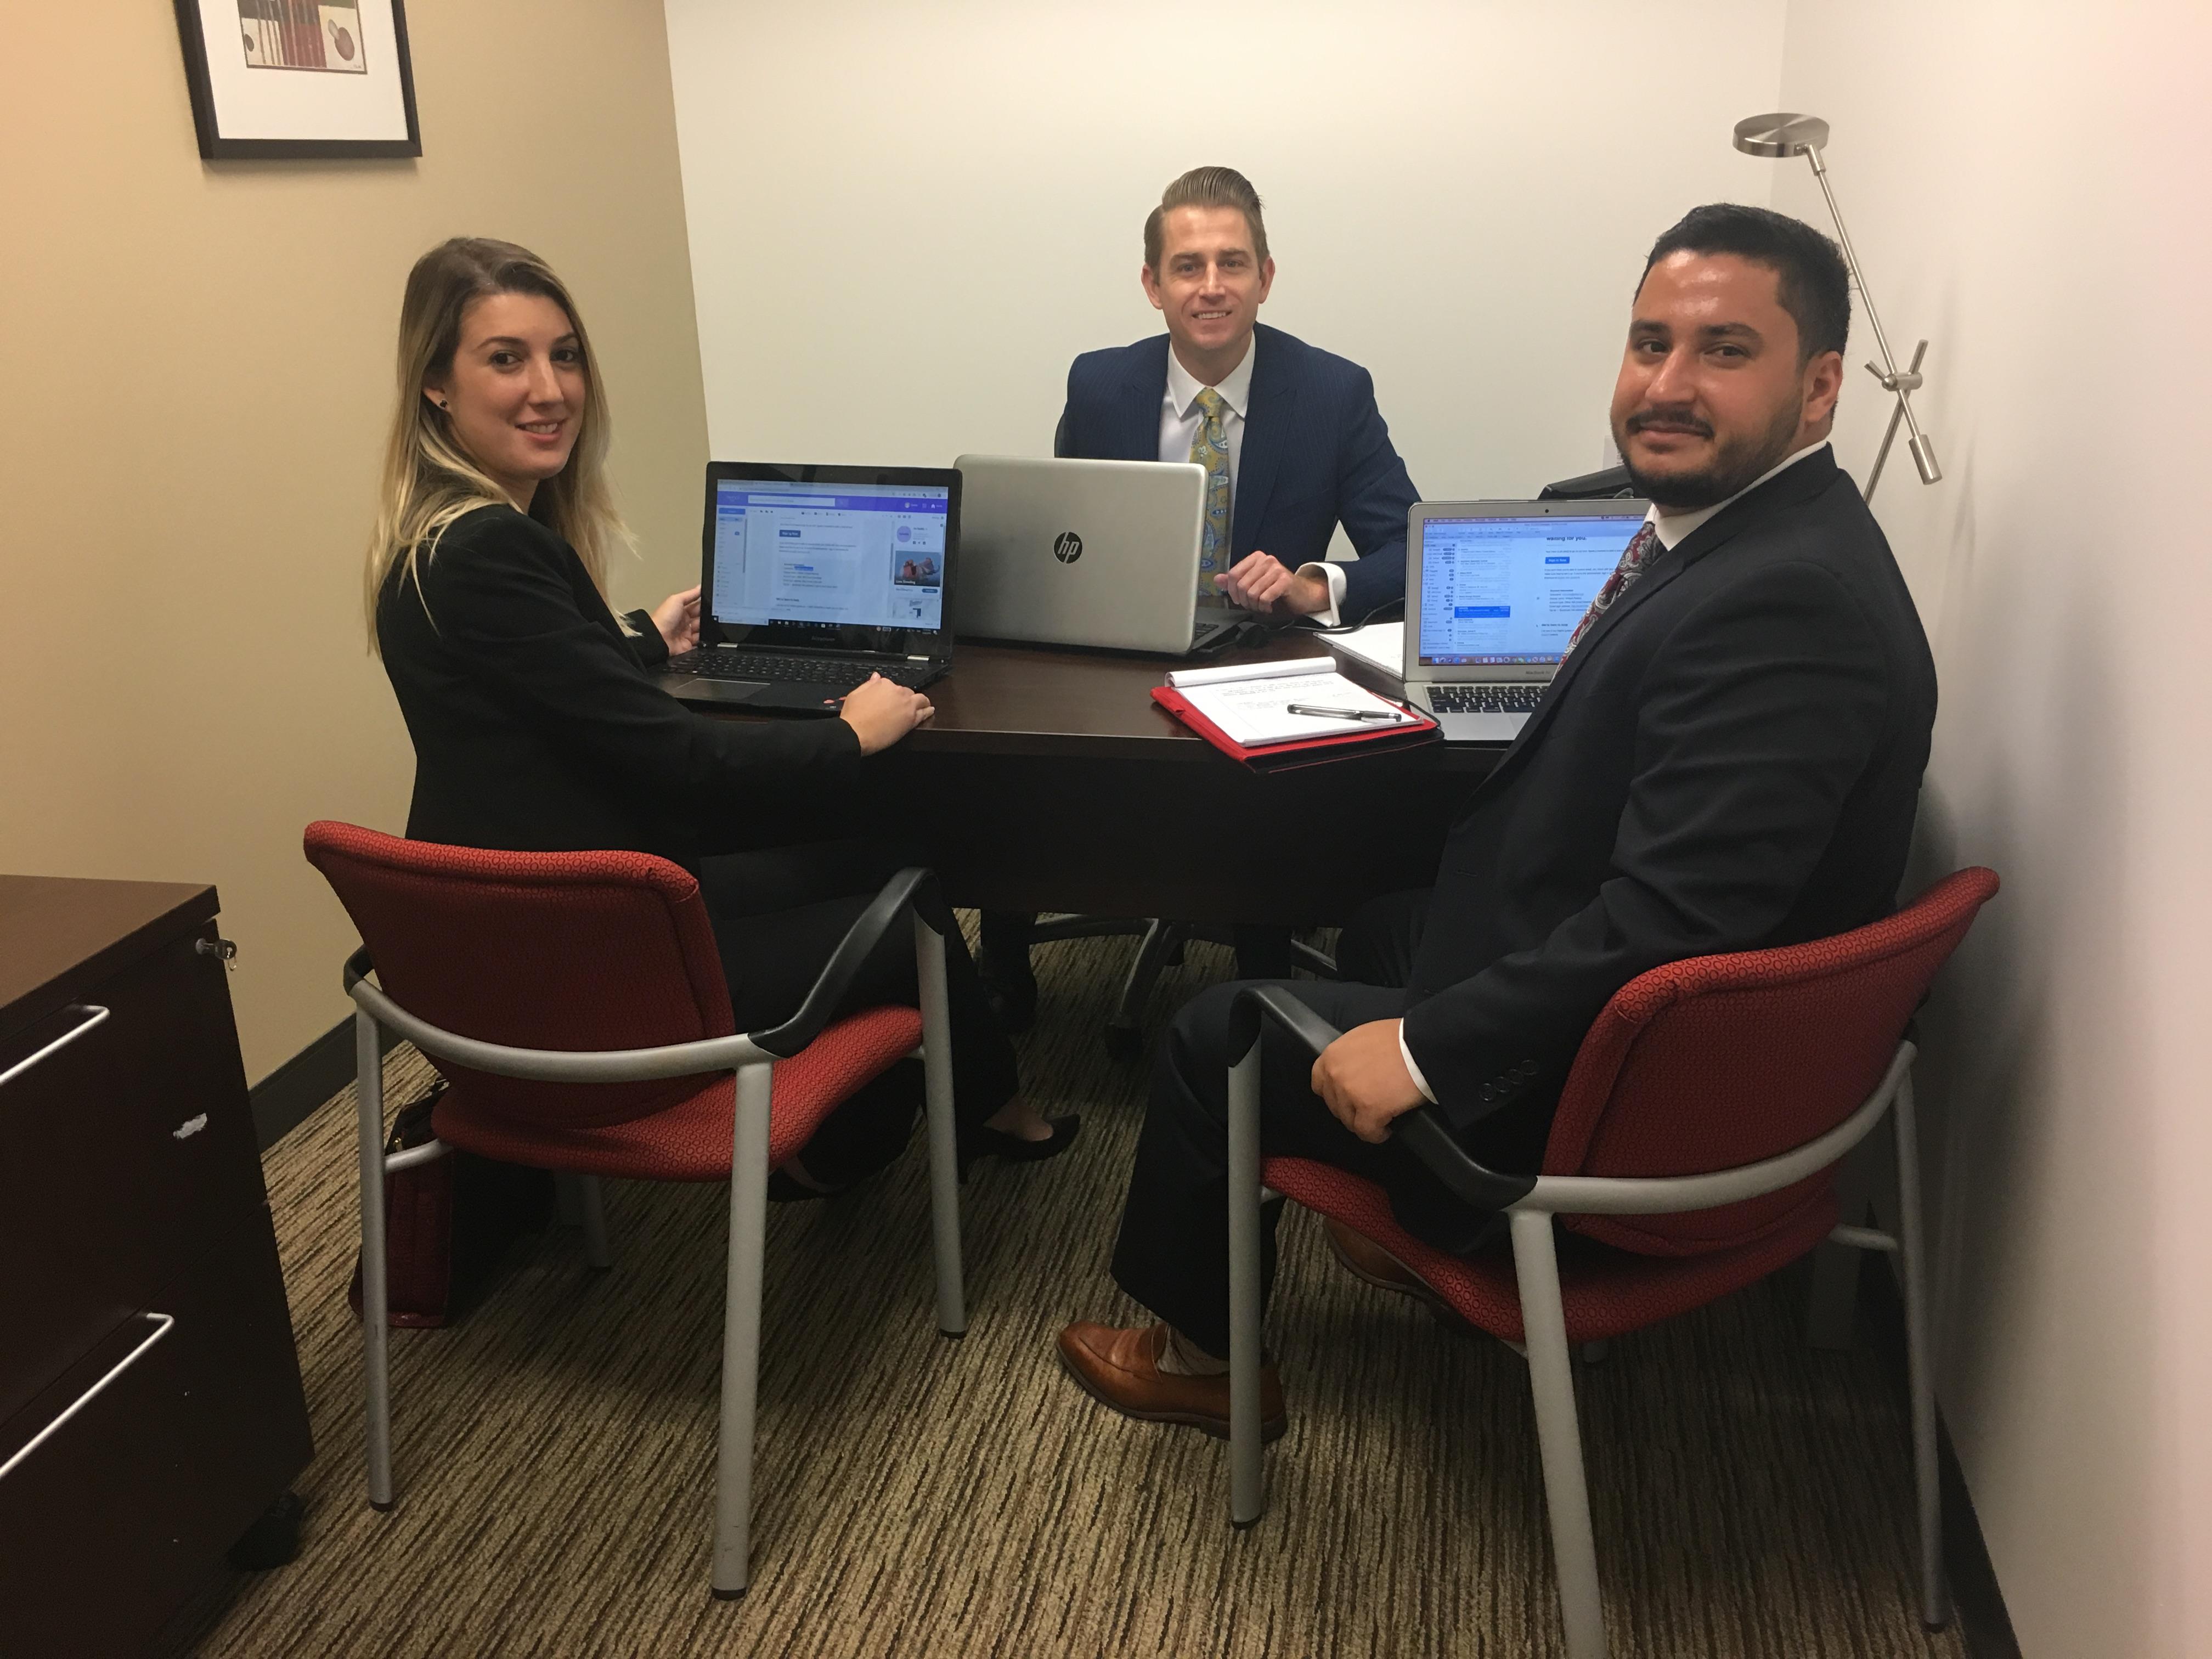 international tax advisors inc. miami ft. lauderdale doral international tax accountant CPA 2019 interns 2 sit